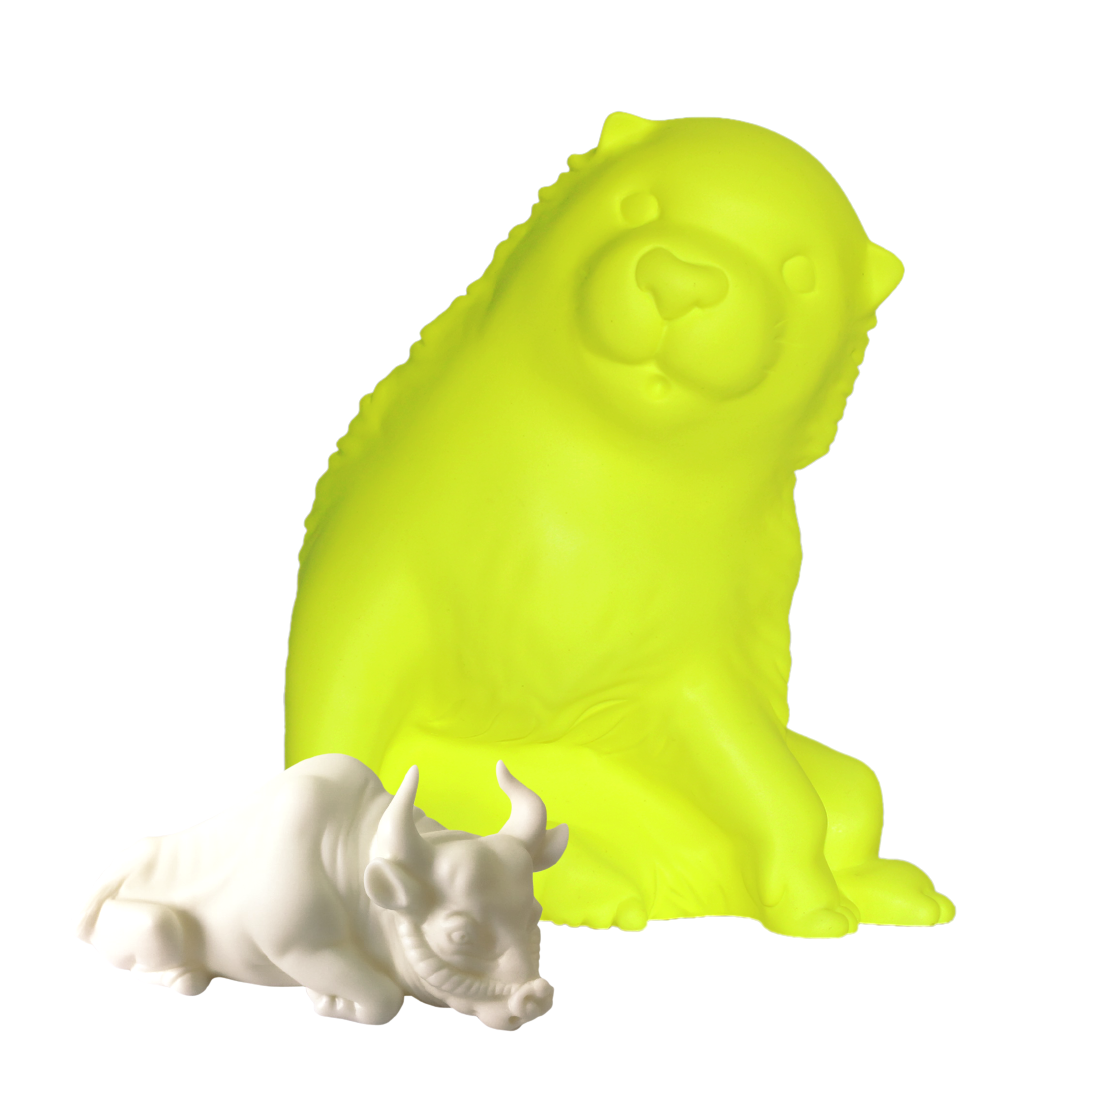 WAZURI -犬- パステルカラー【イエロー】